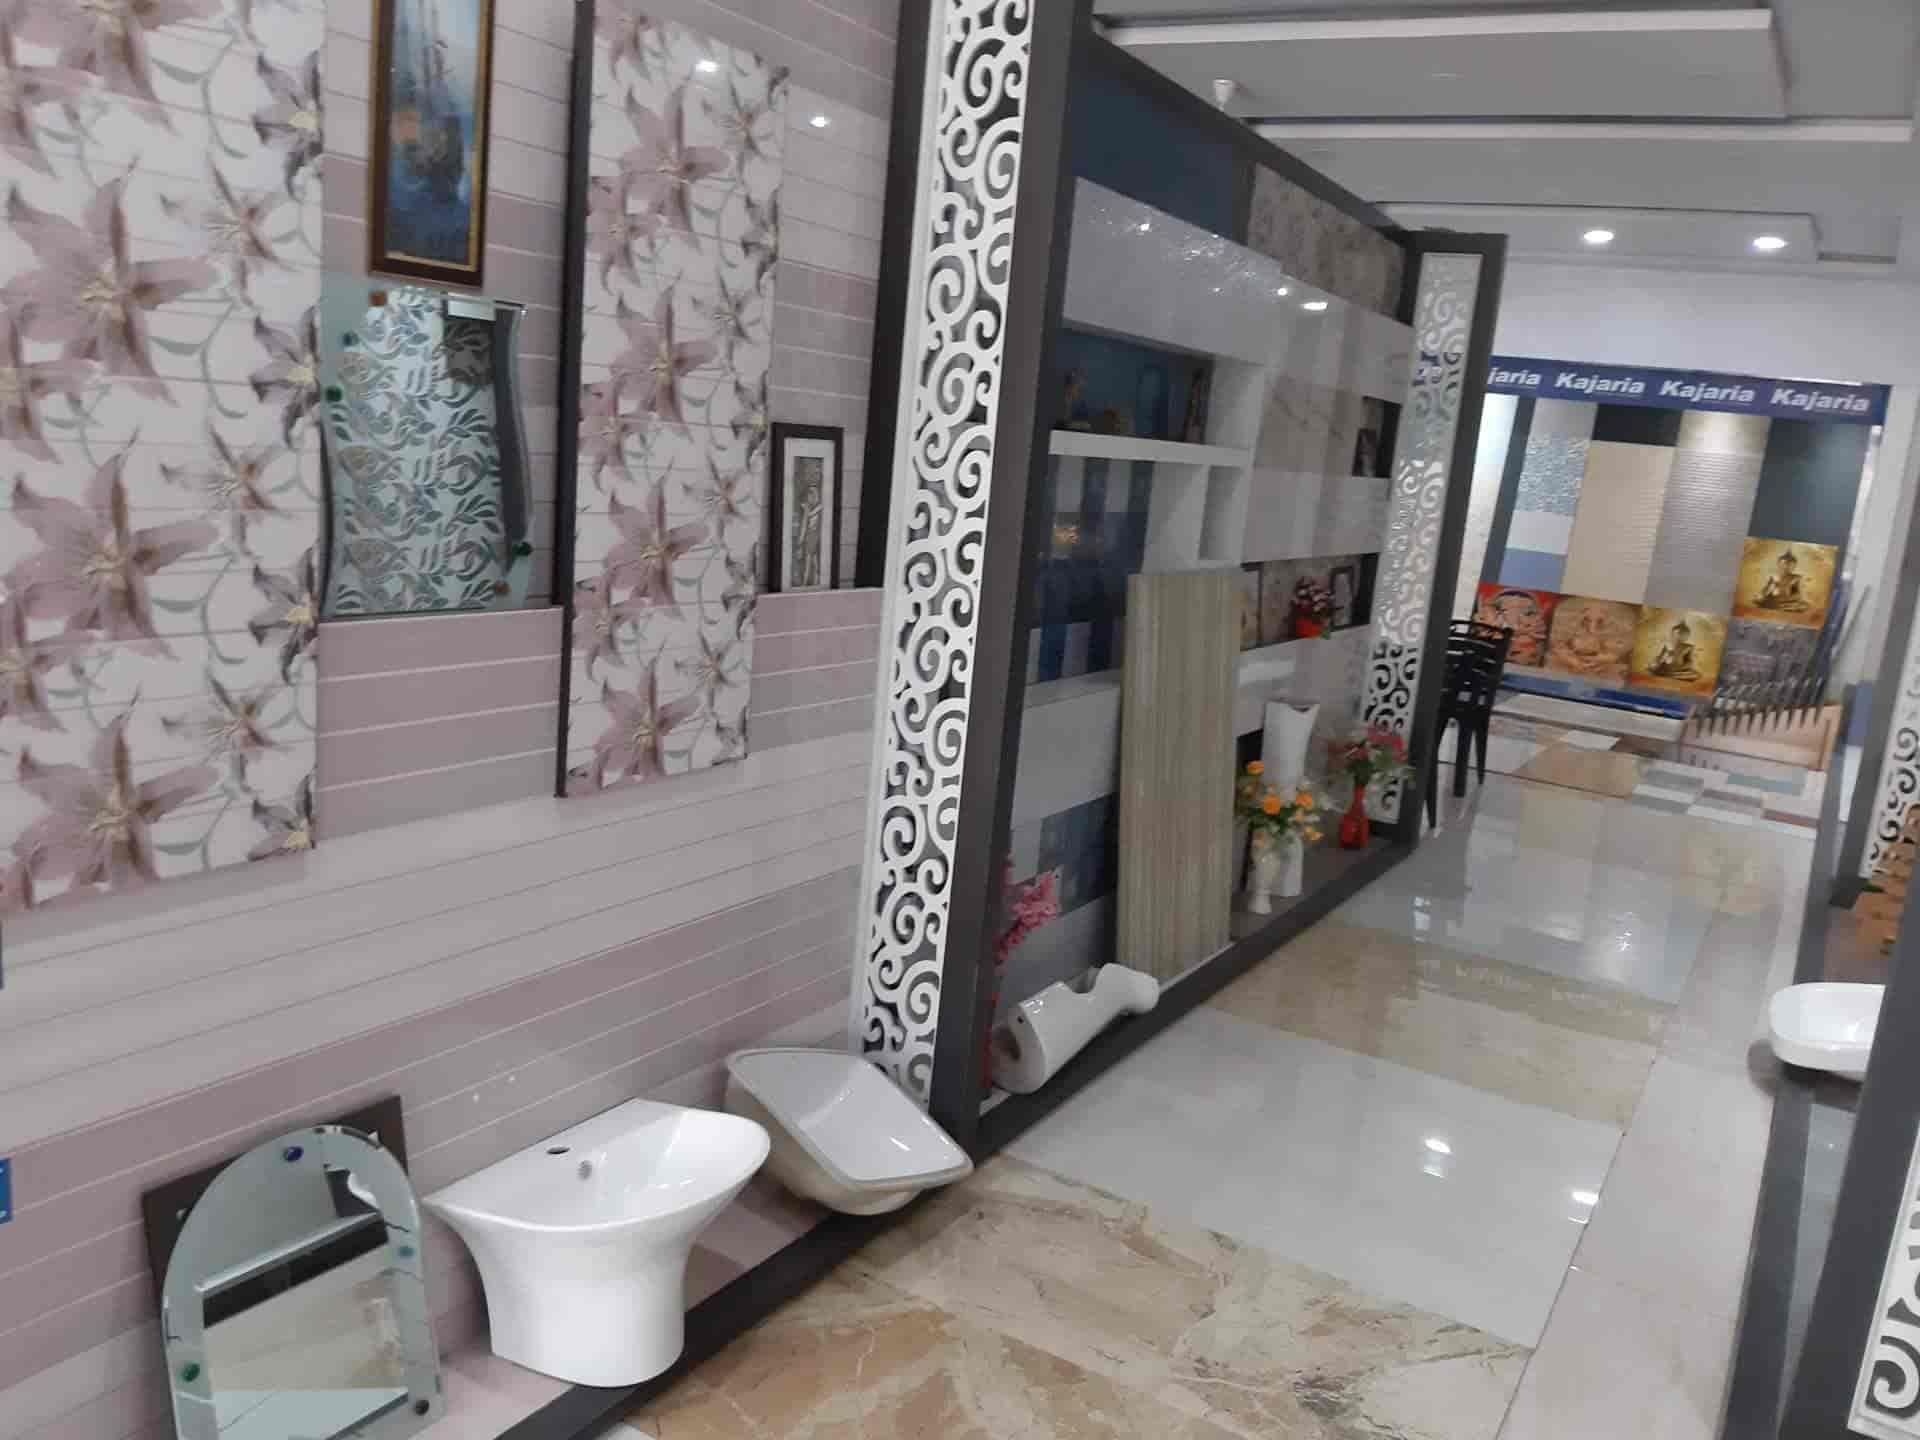 25 Best Ceramic Tiles for Bathroom images: kajaria ...